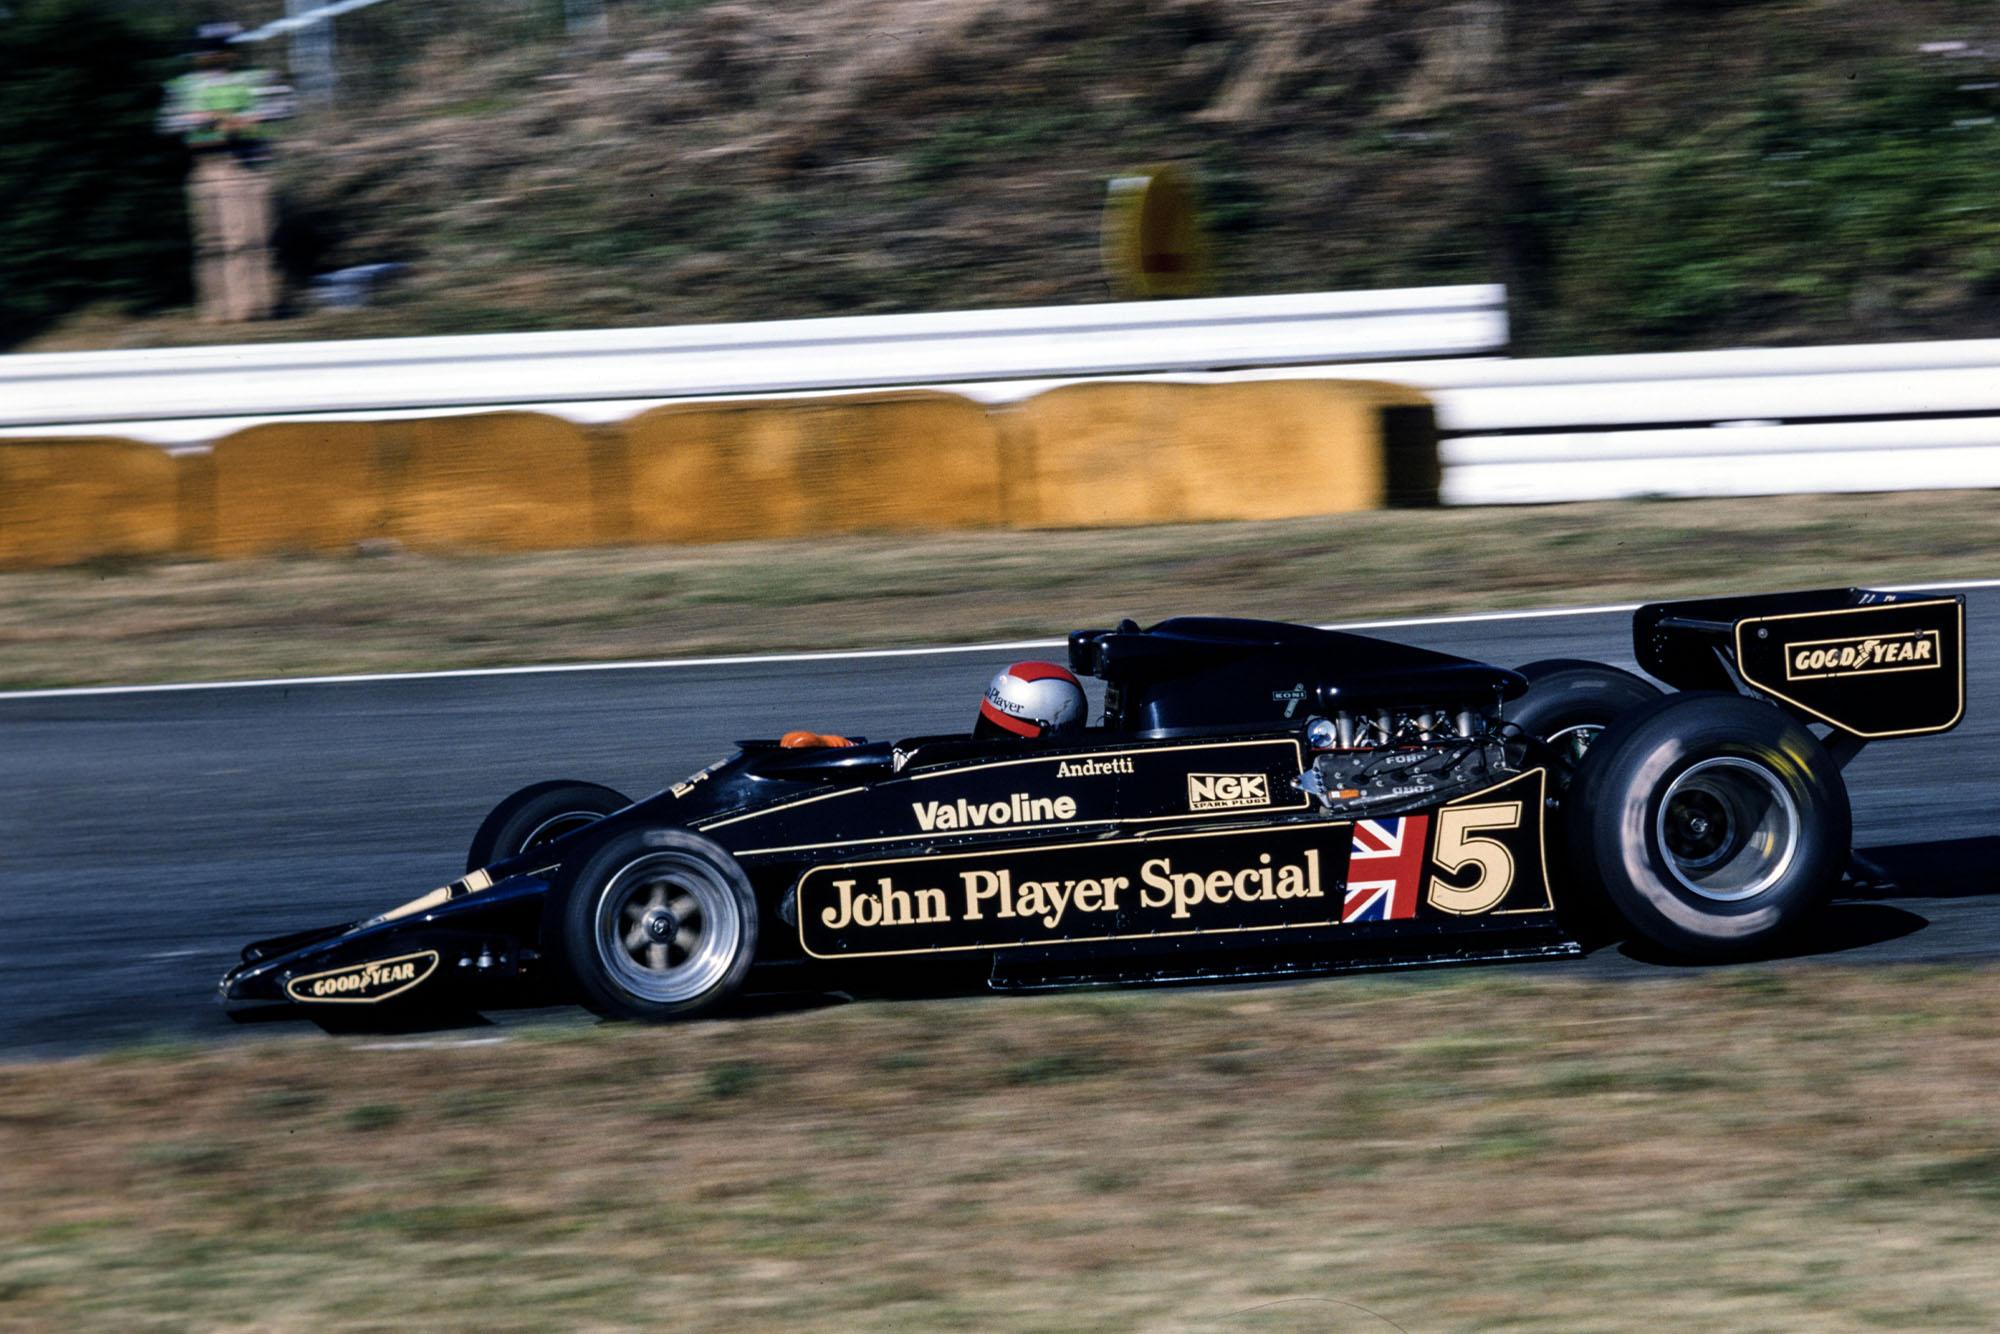 Mario Andretti (Lotus), at the 1977 Japanese Grand Prix, Fuji.